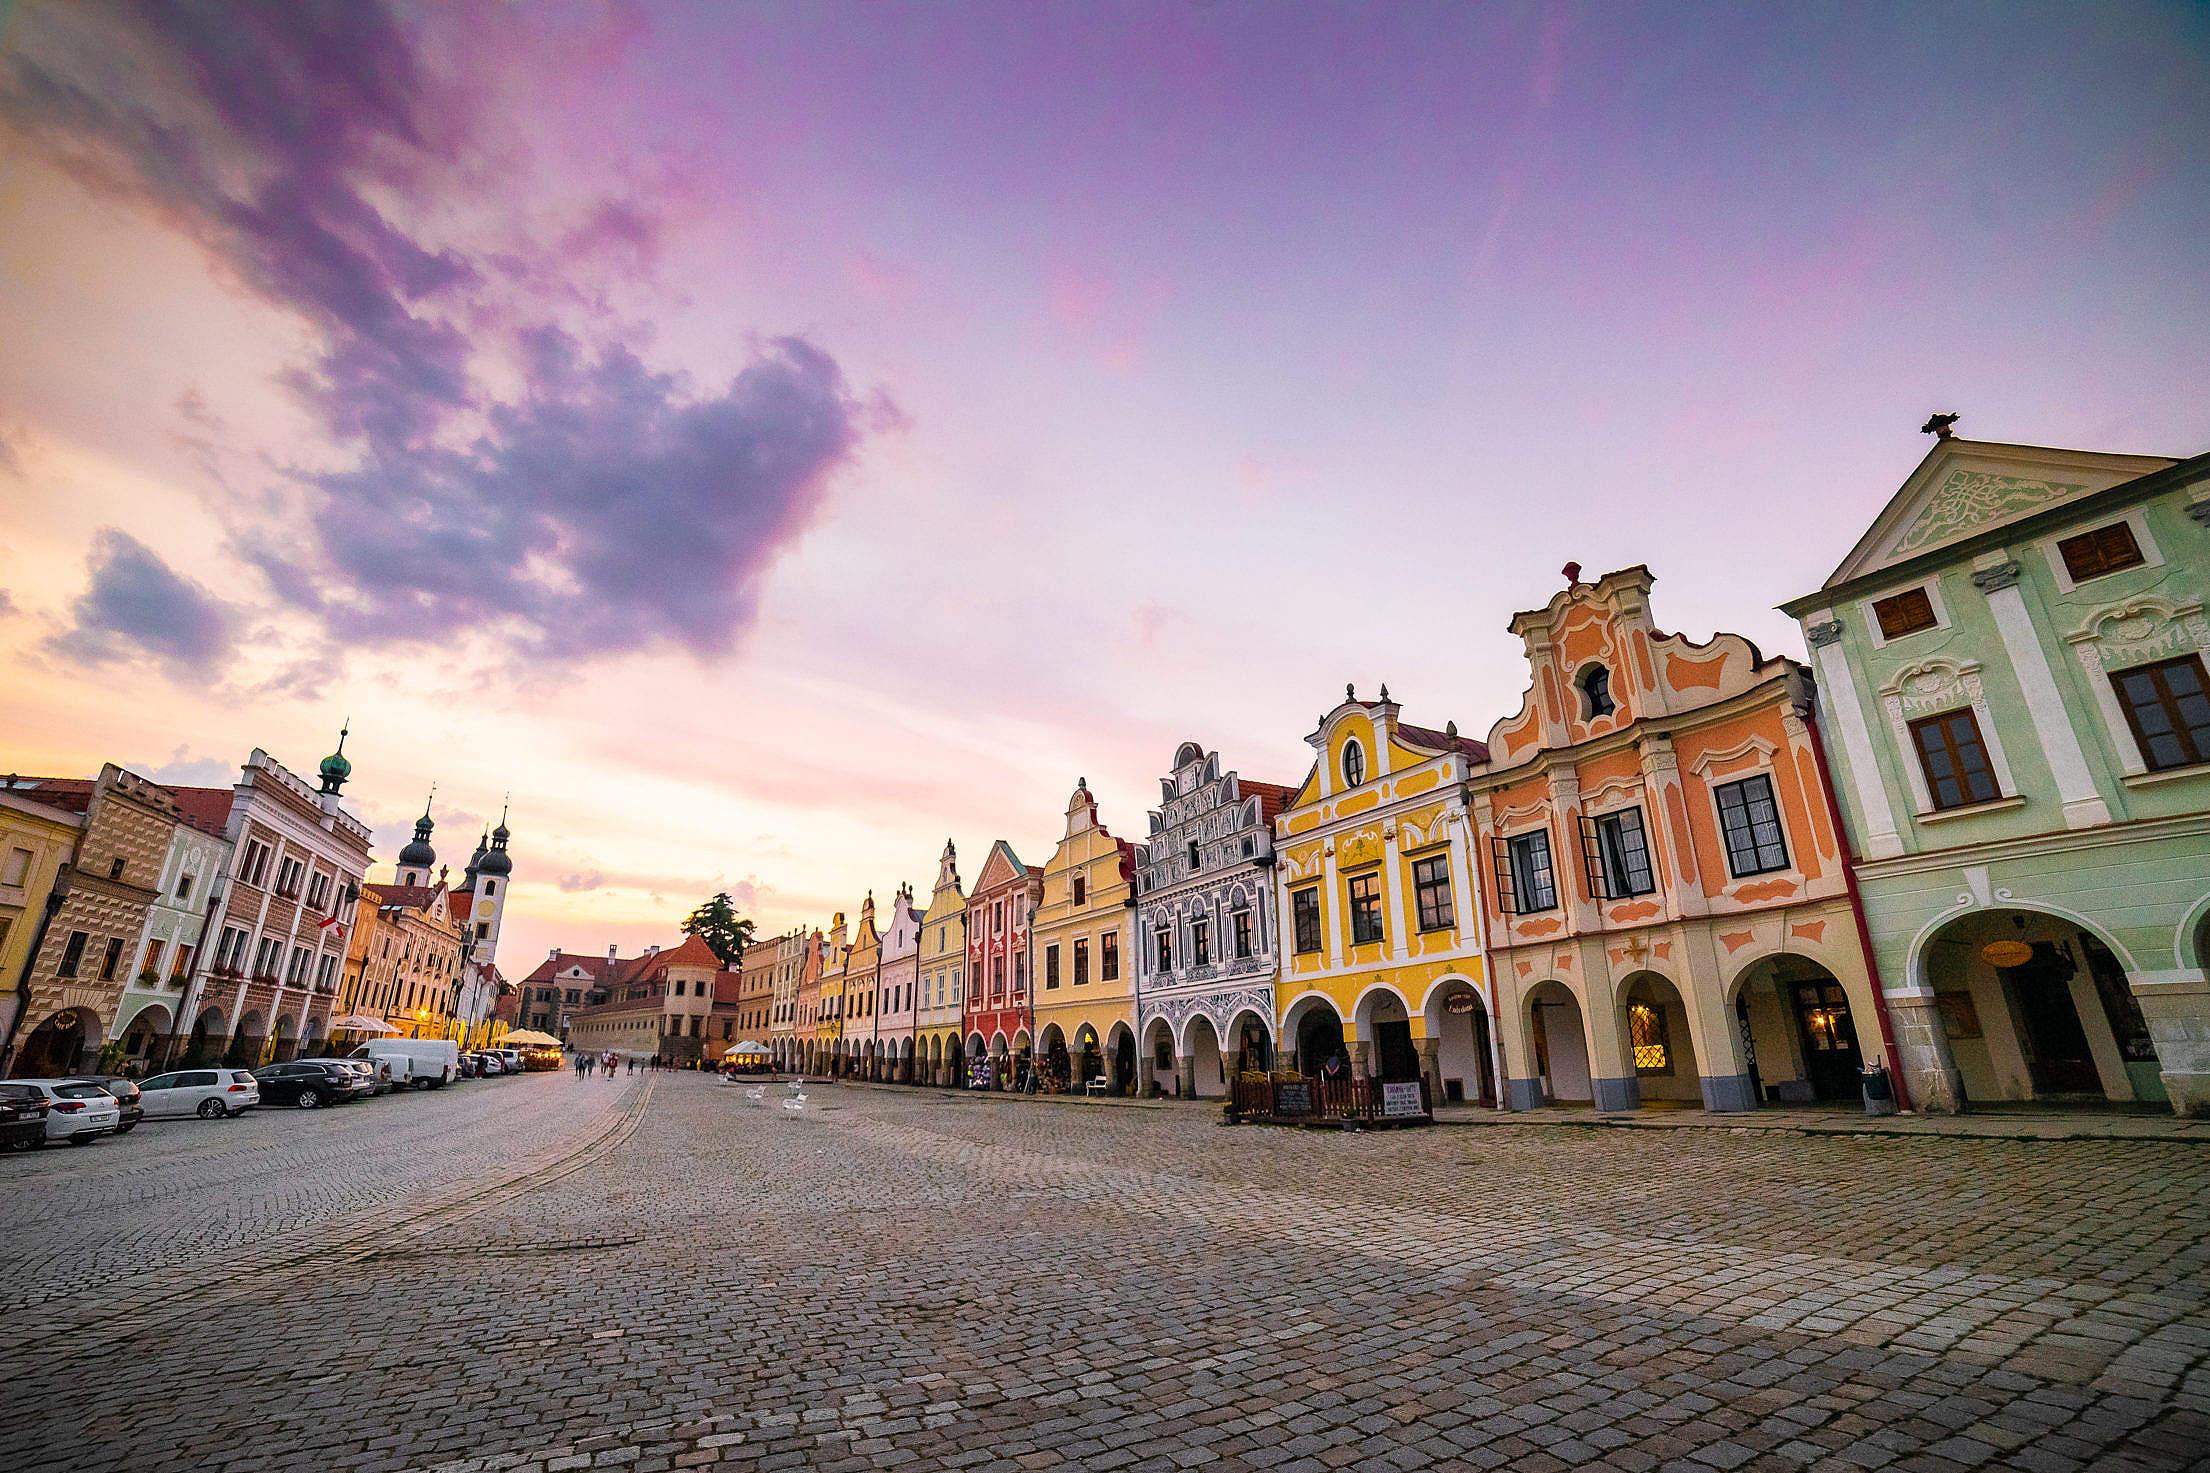 Colorful Square of Czech City Telč Free Stock Photo